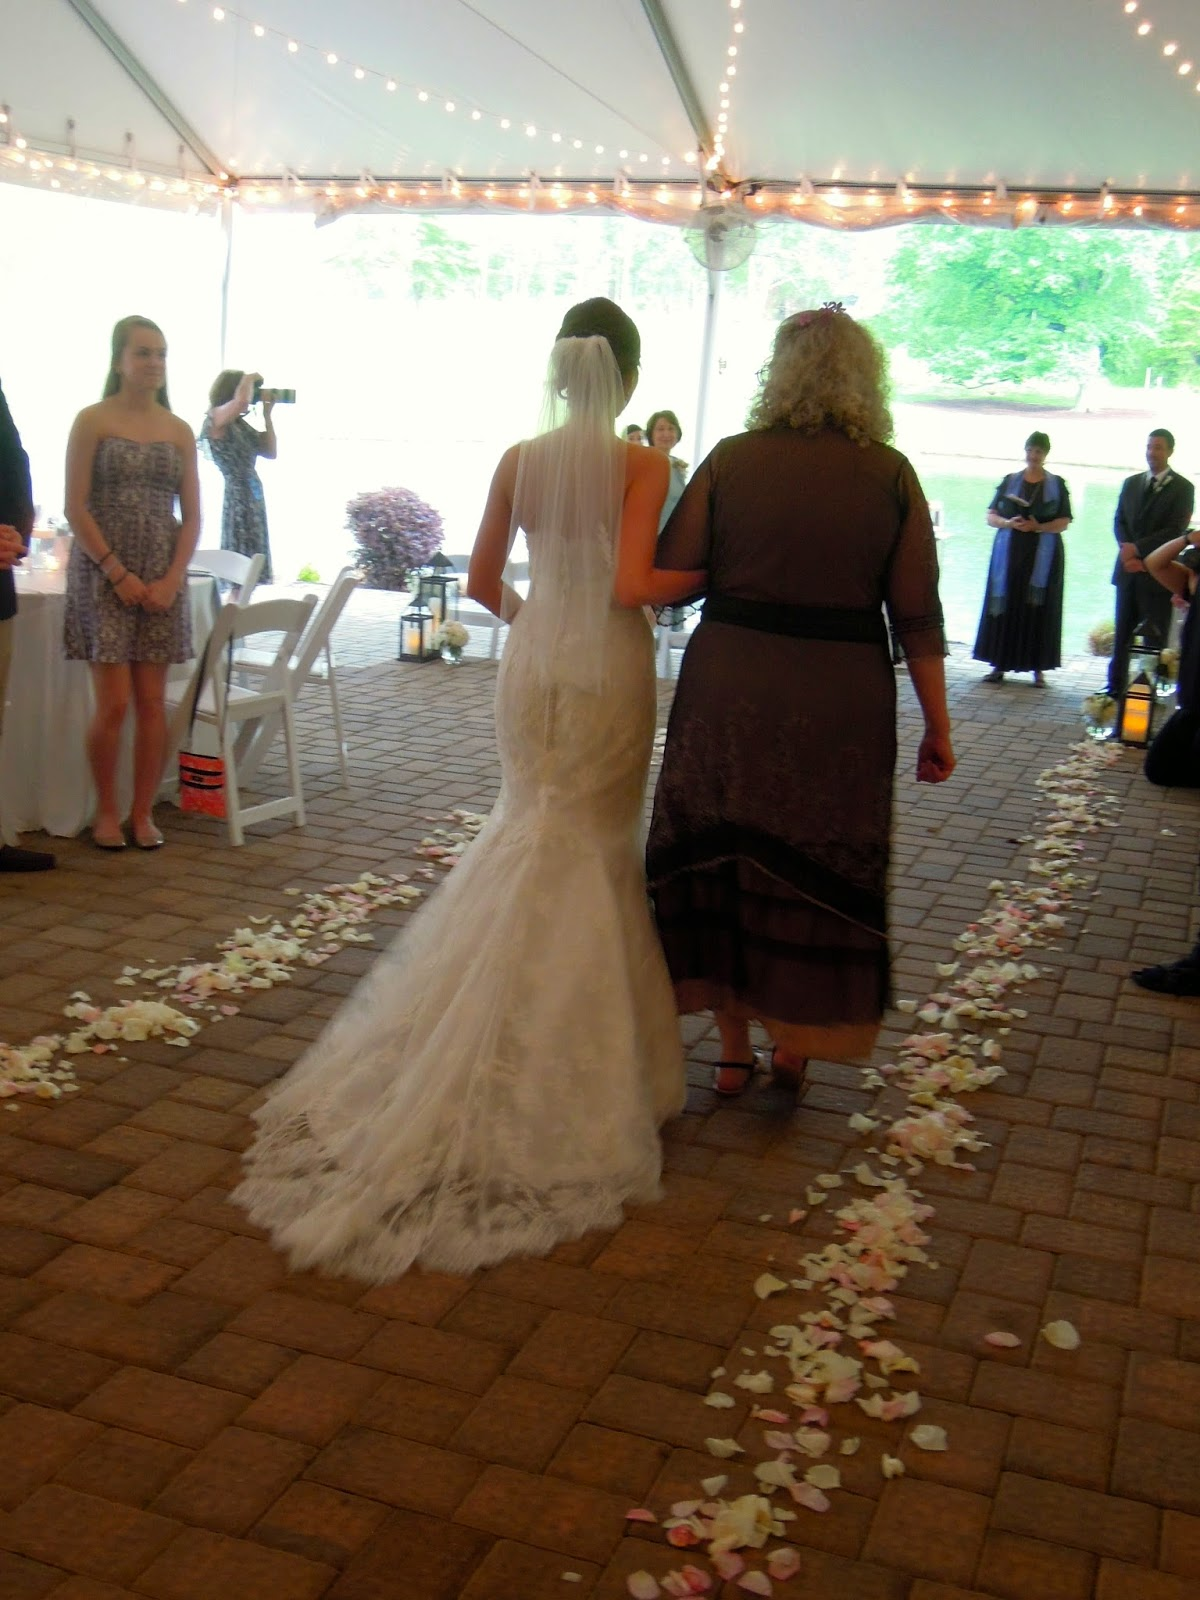 Raleigh Wedding Blog: April 2014